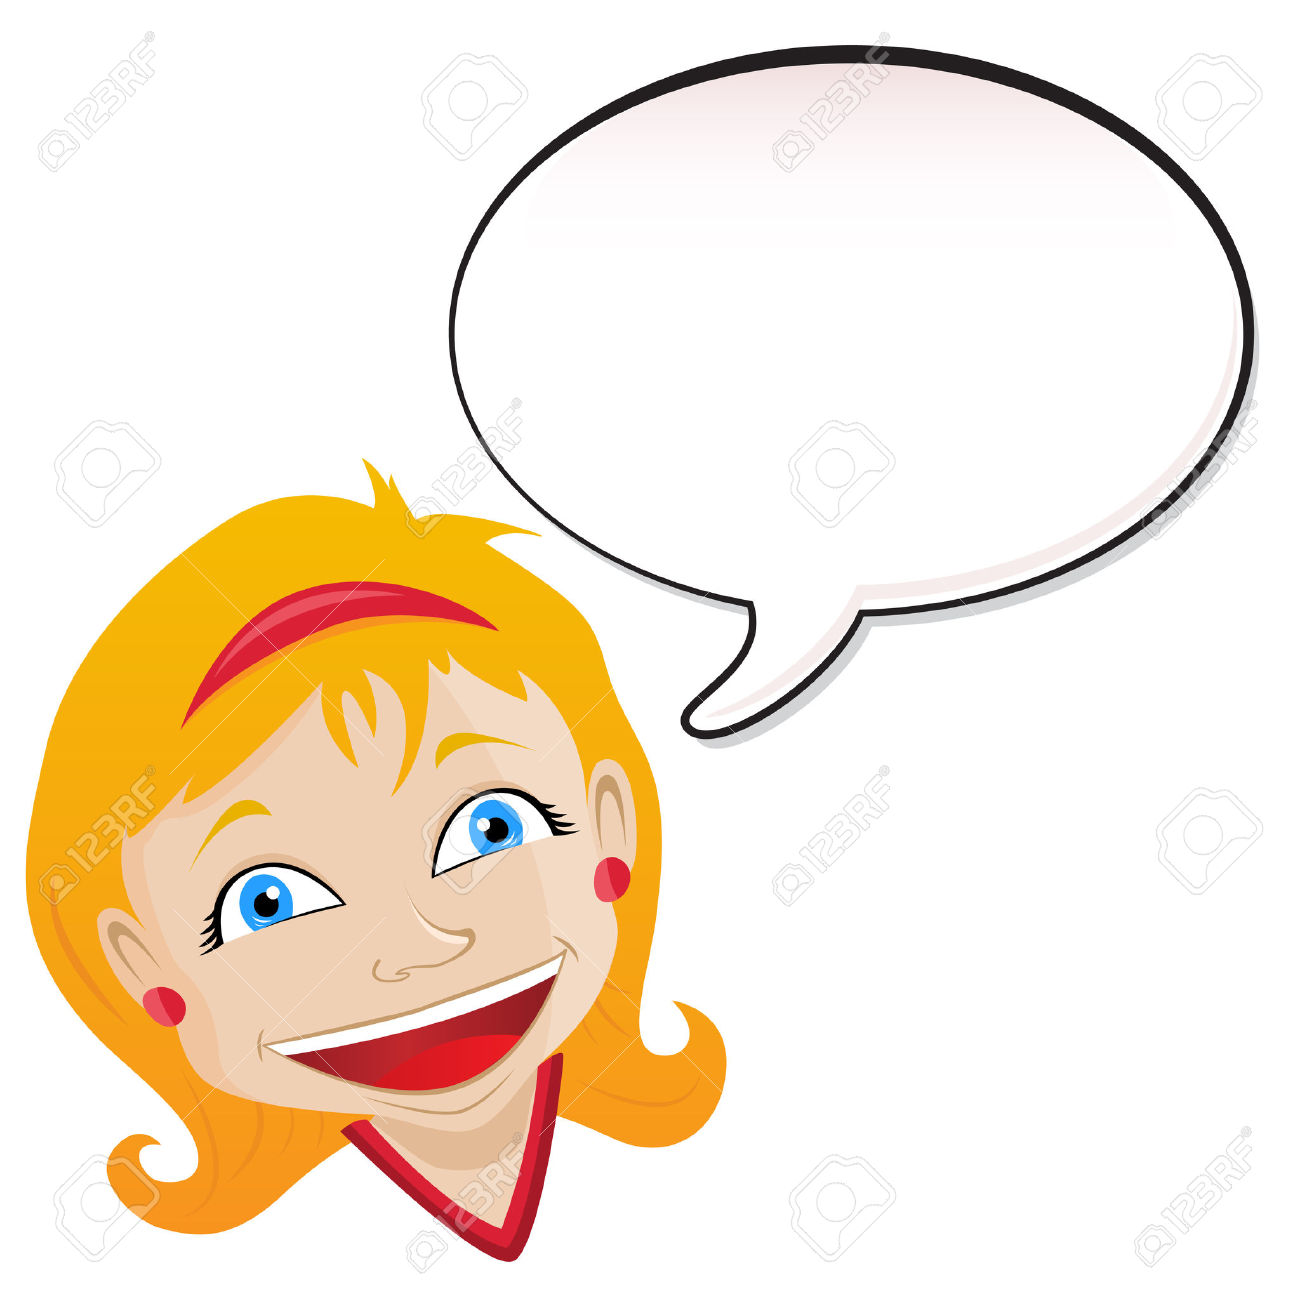 Clipart teacher talking bubble clip library download Cartoon Talk Bubble | Free download best Cartoon Talk Bubble on ... clip library download